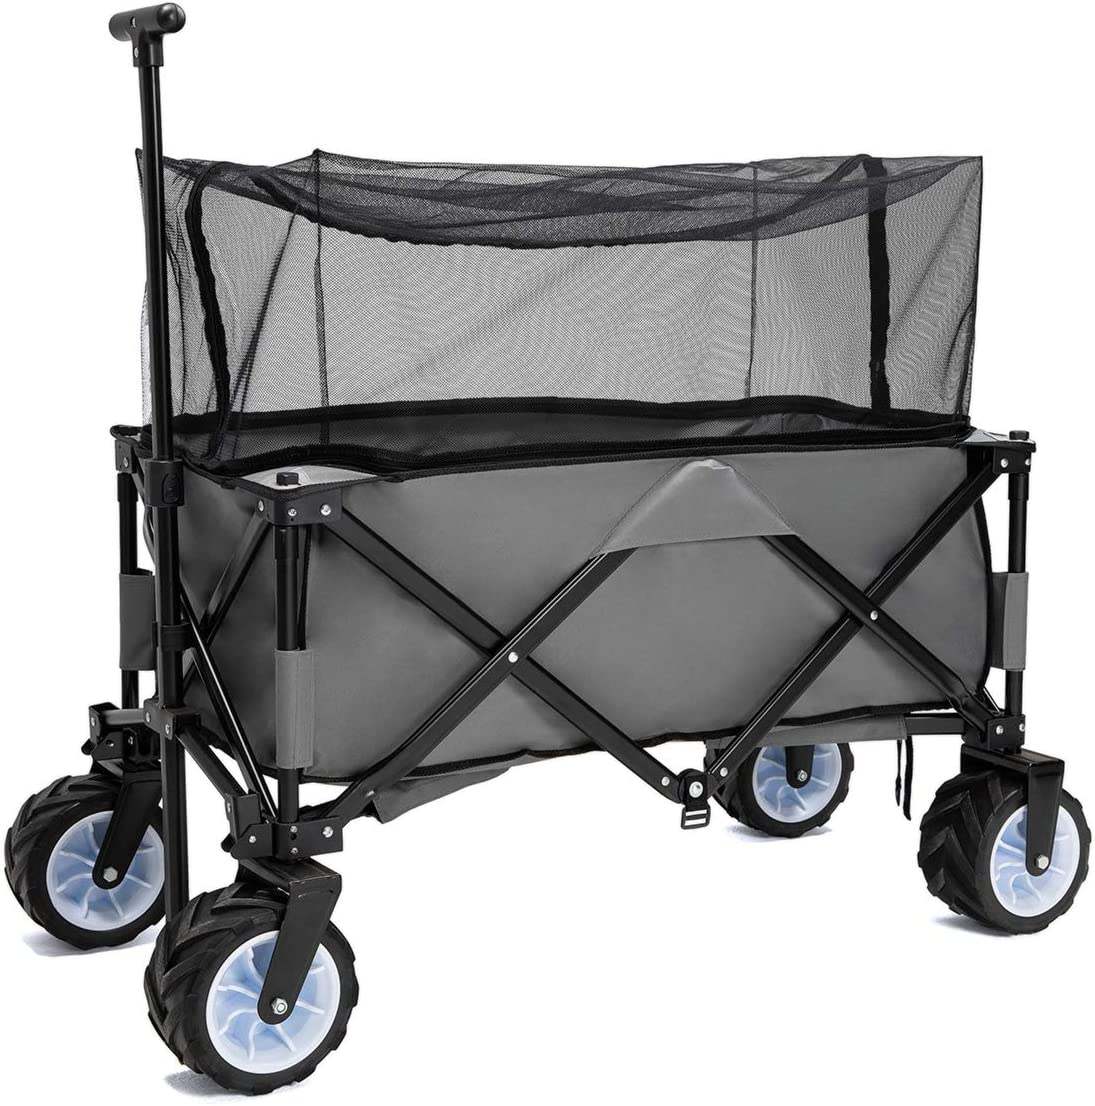 PA Outdoor Utility Foldable Wagon